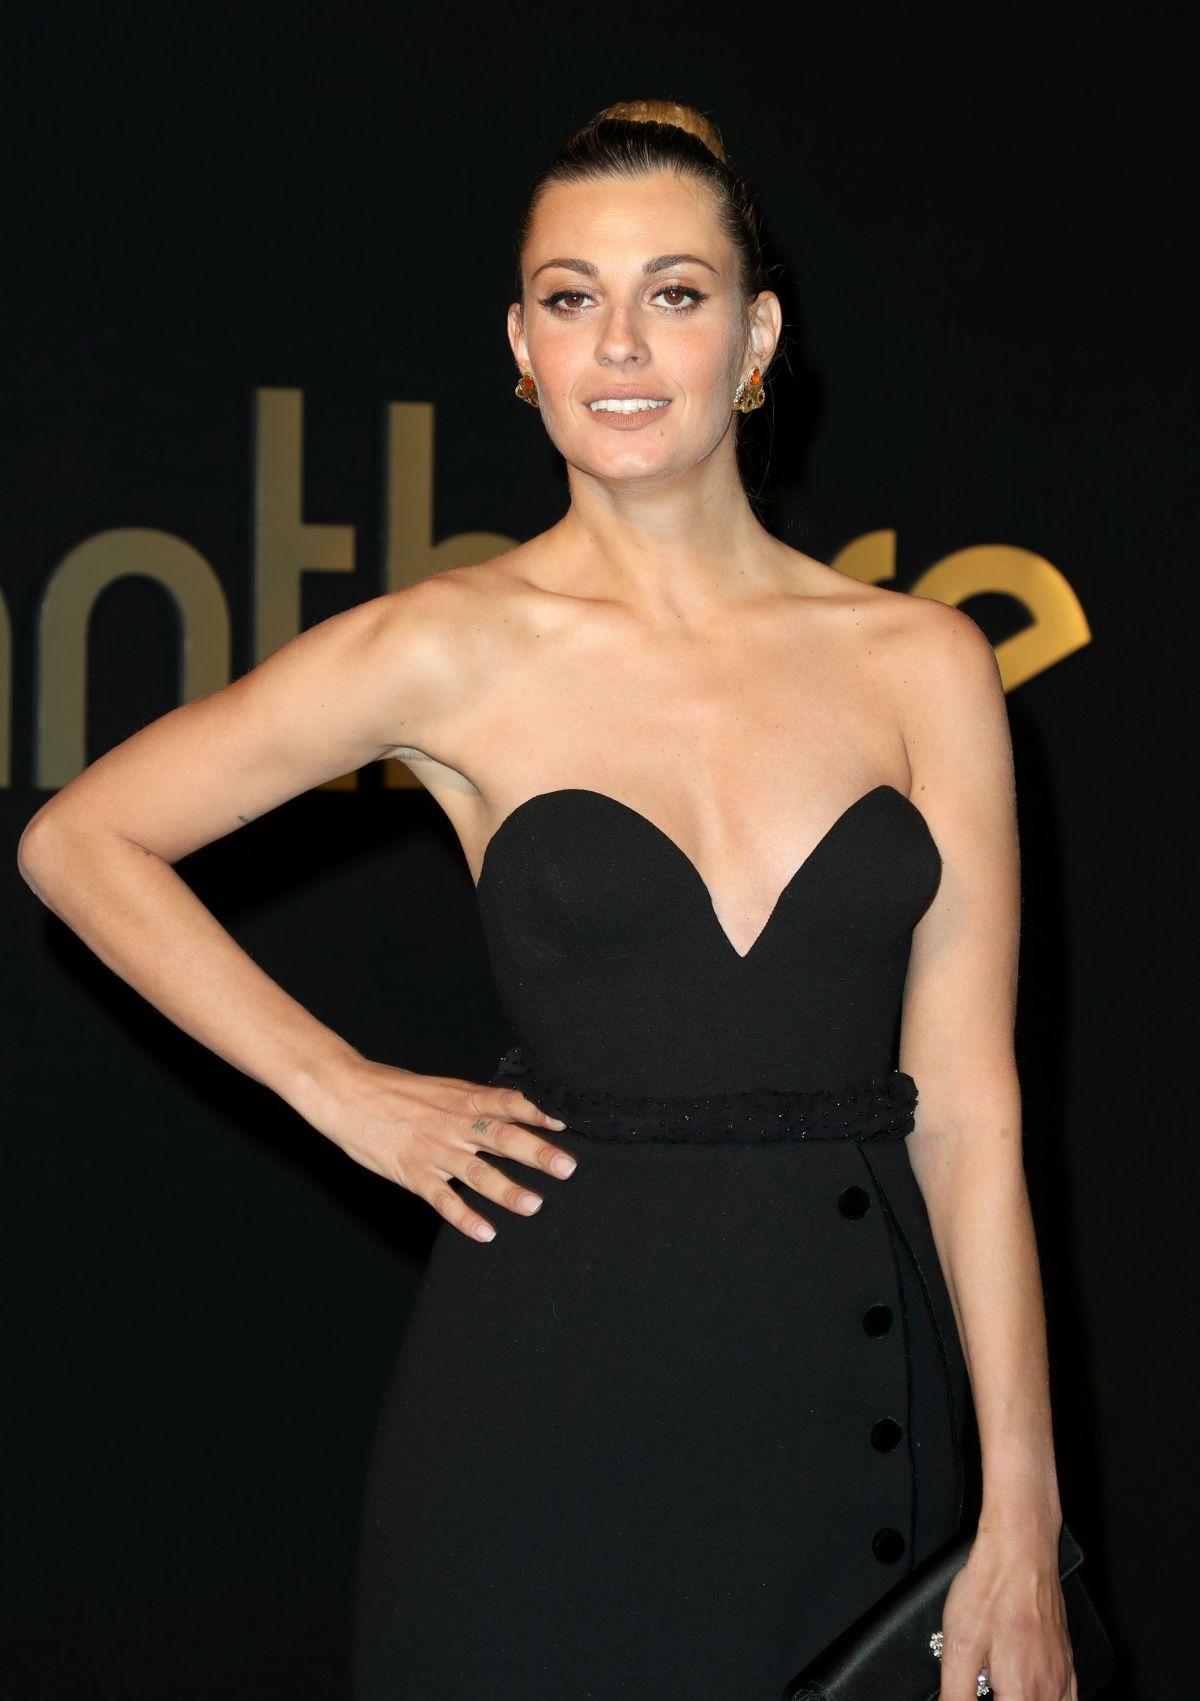 Sveva alviti panthere de cartier watch launch in la nudes (11 photo), Hot Celebrity fotos